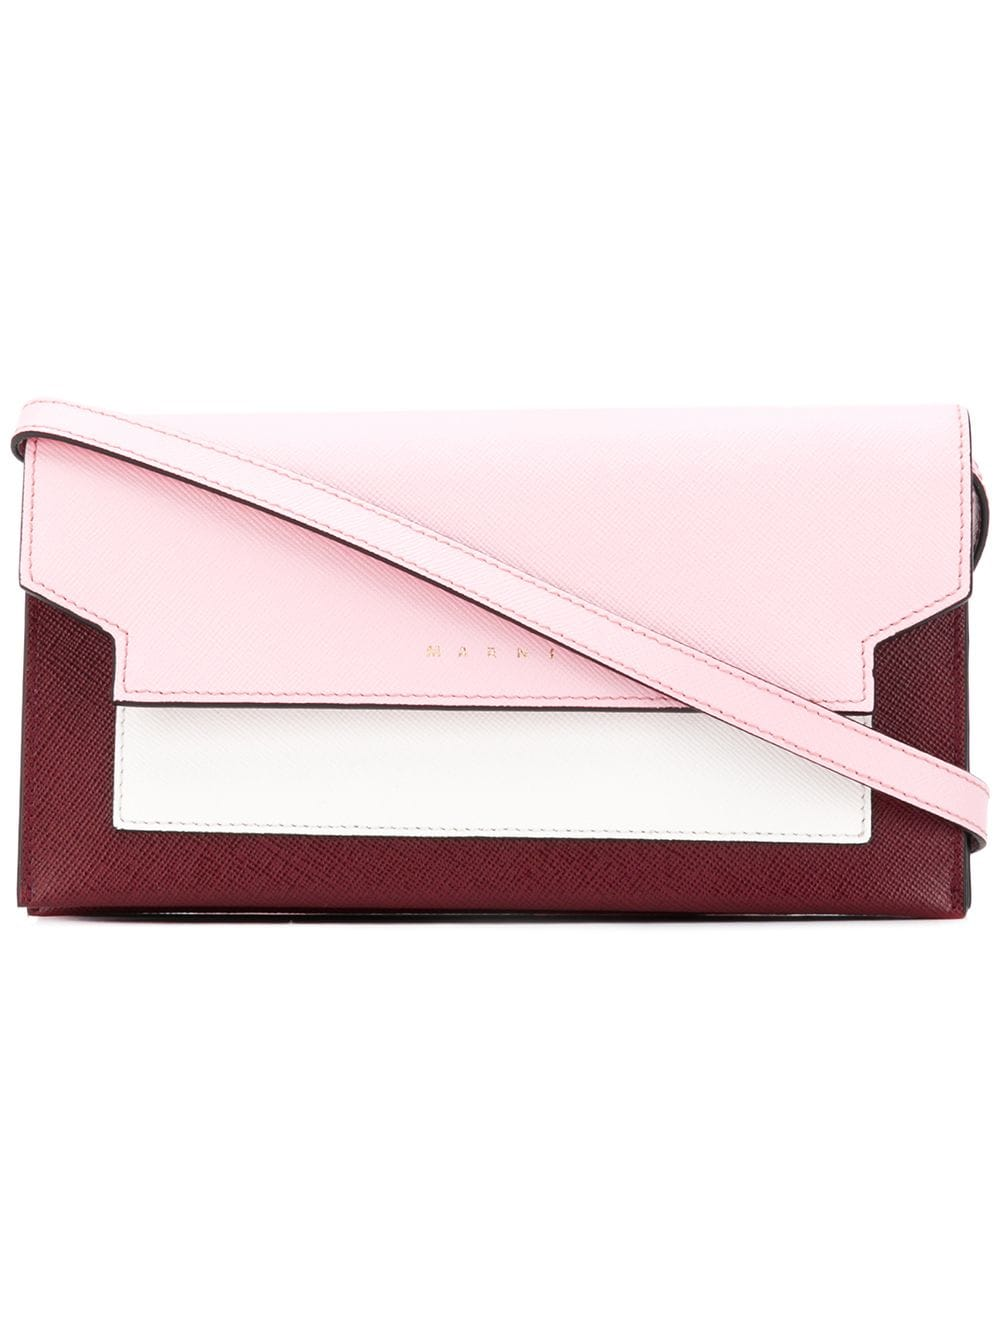 Marni Dreifarbiges Portemonnaie - Rosa